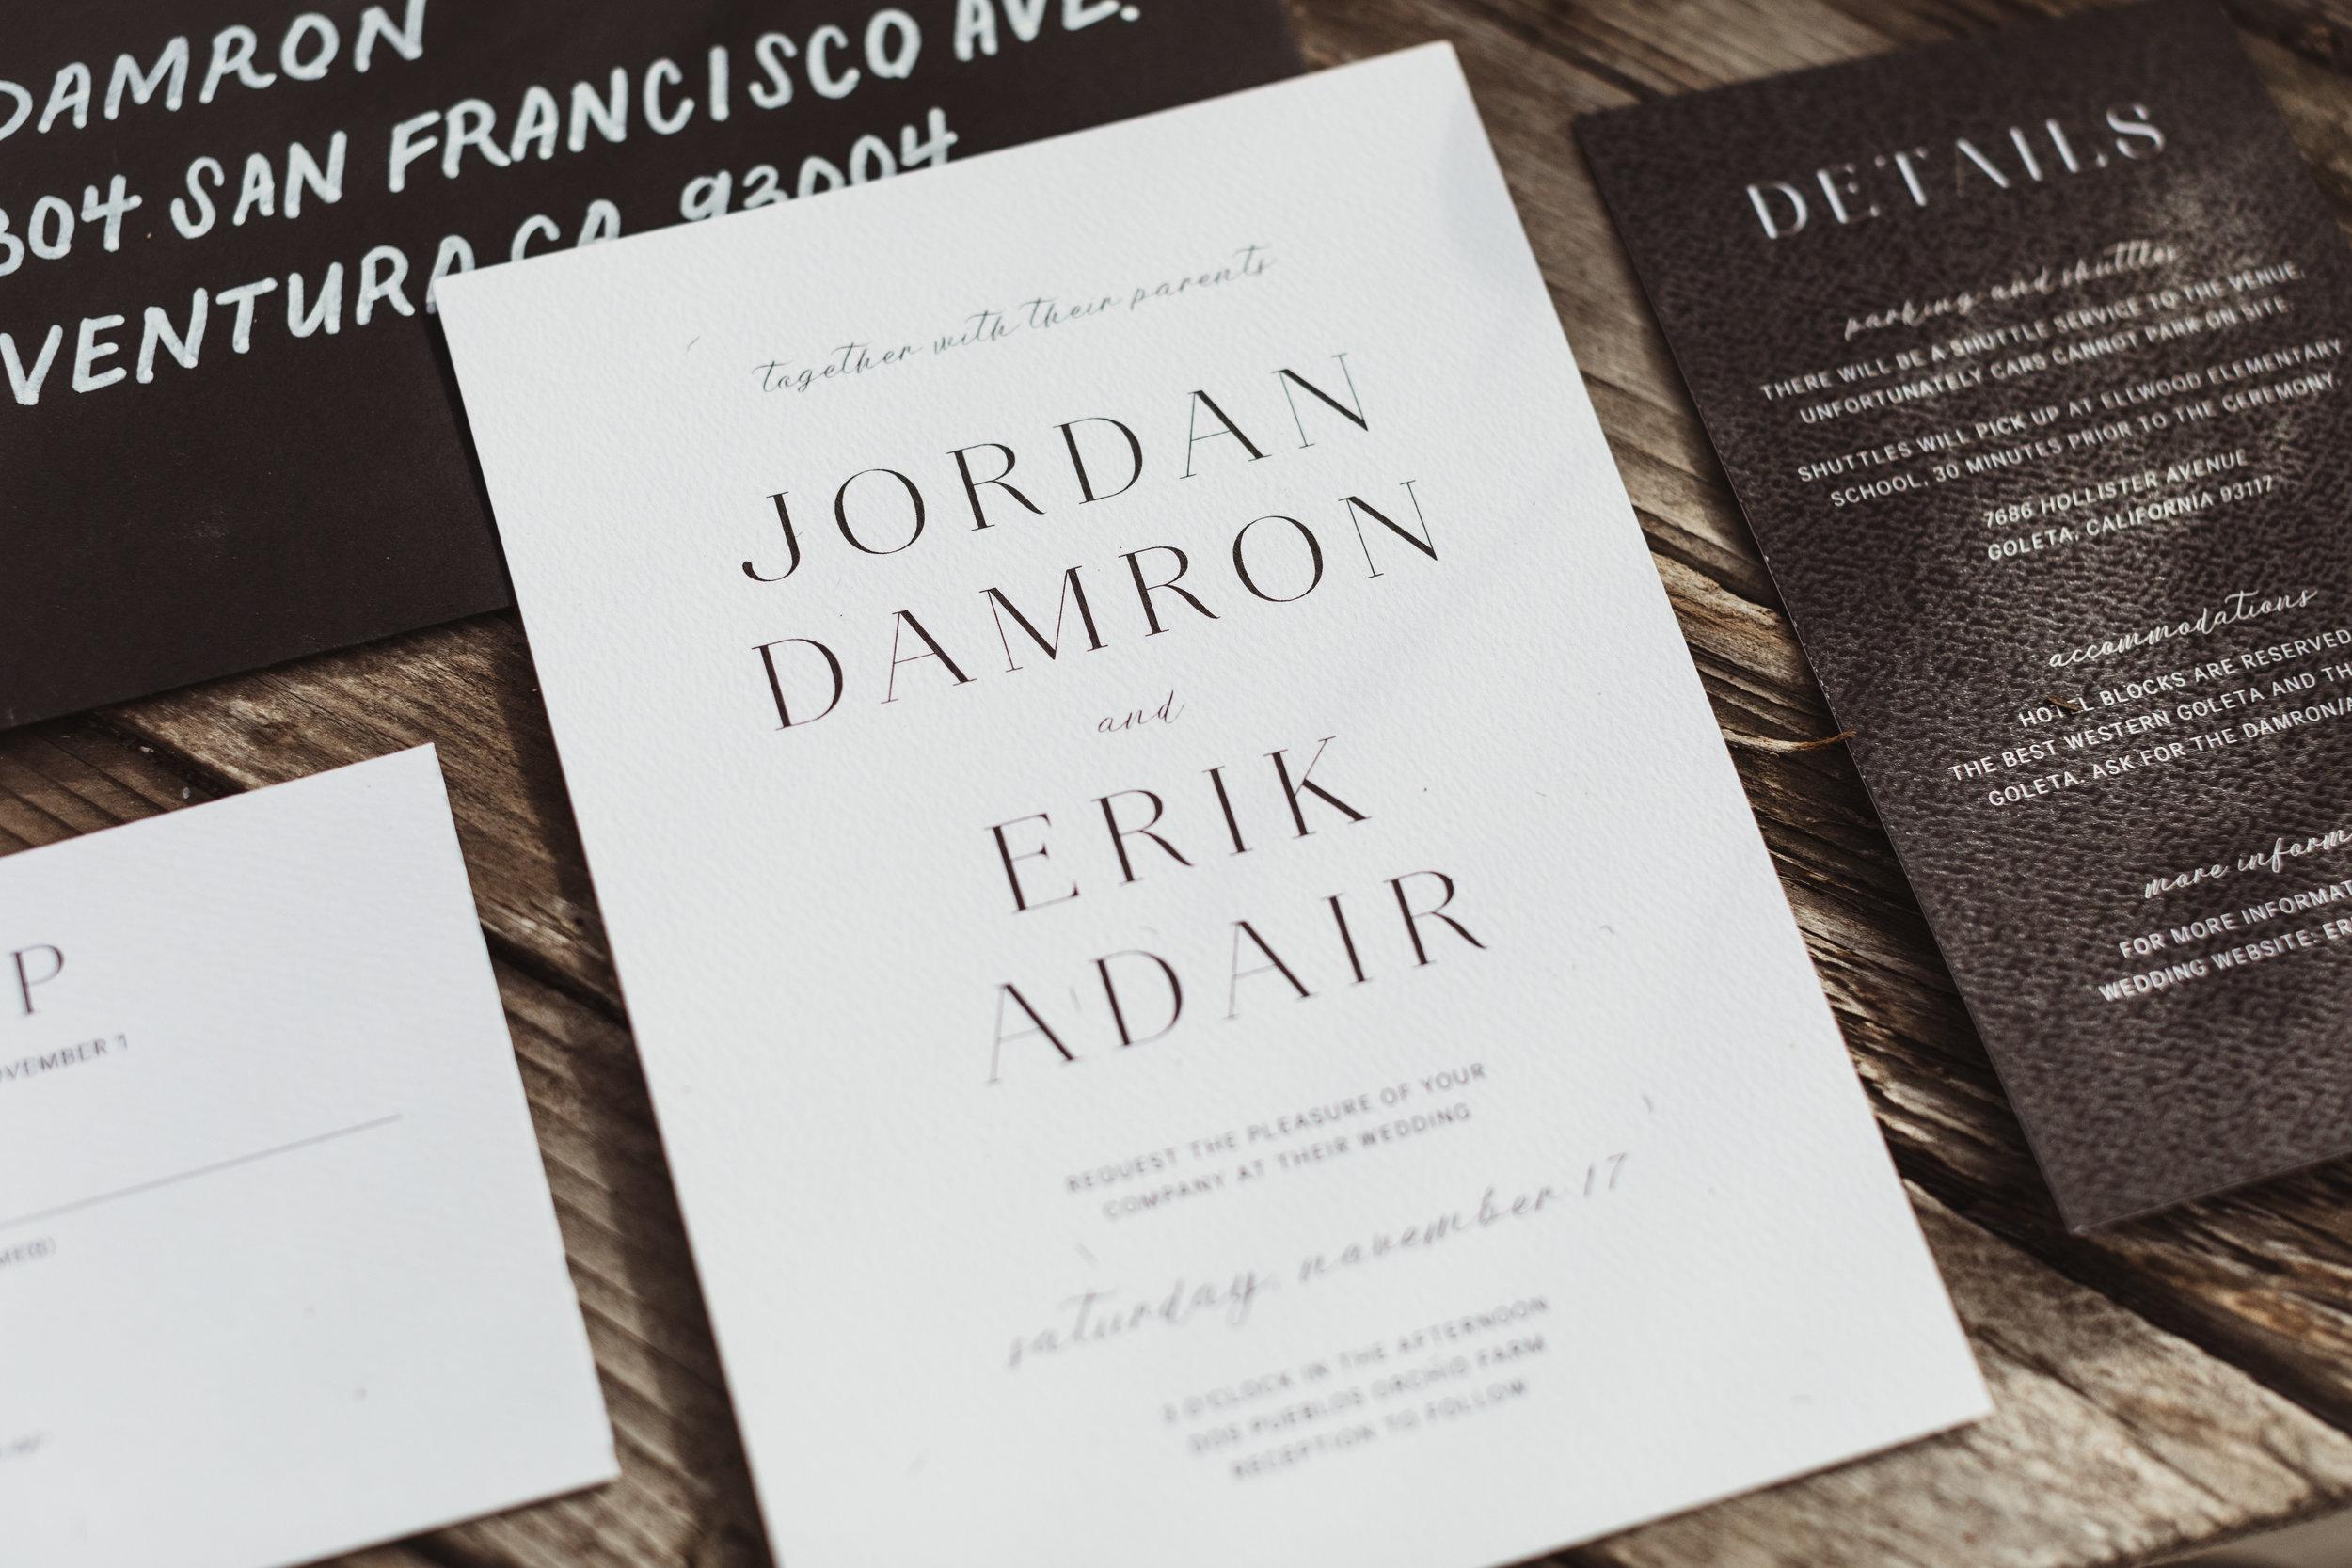 Jamie_English_Photography_JordanErik_Dos_Pueblos_Orchid_Wedding_Santa_Barbara_Fall2018-11.jpg